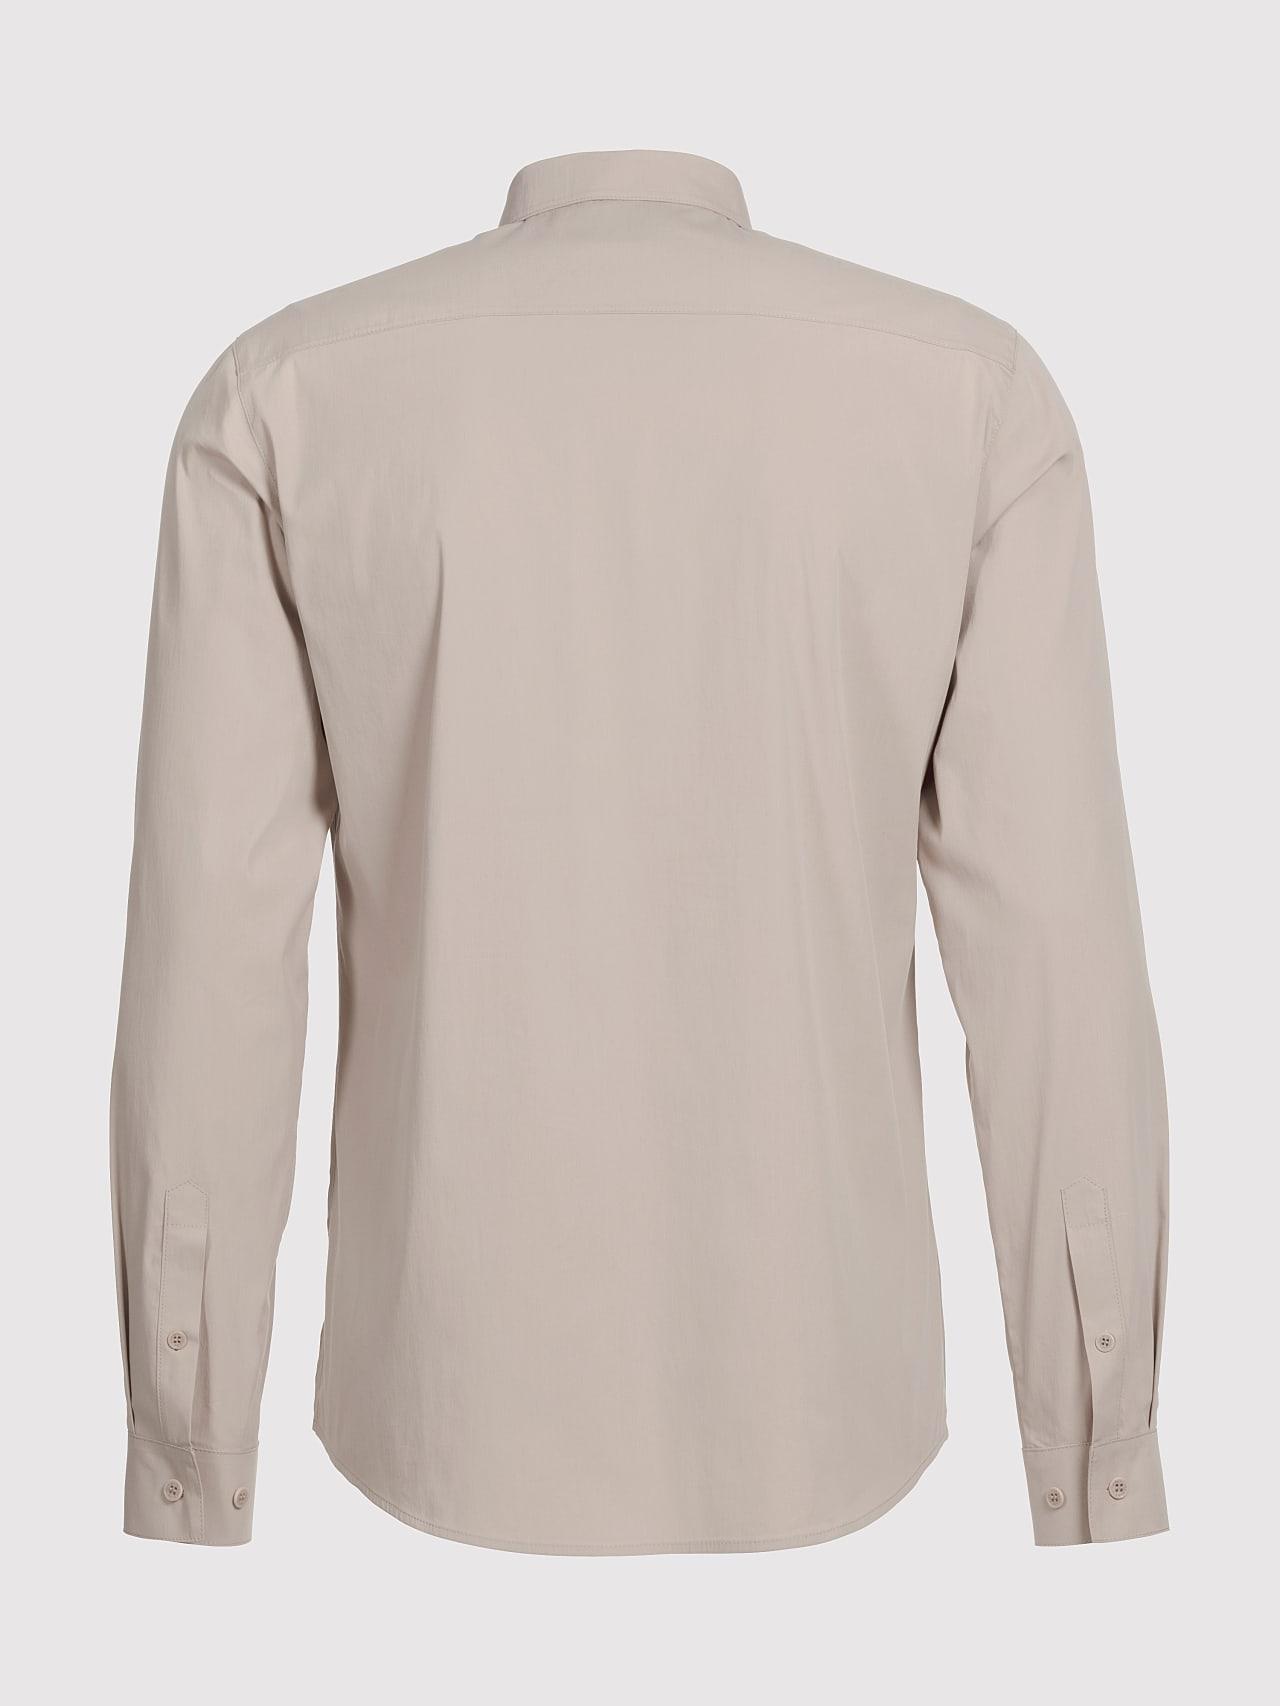 WAARG V1.Y5.01 Cotton-Stretch Shirt Sand Left Alpha Tauri